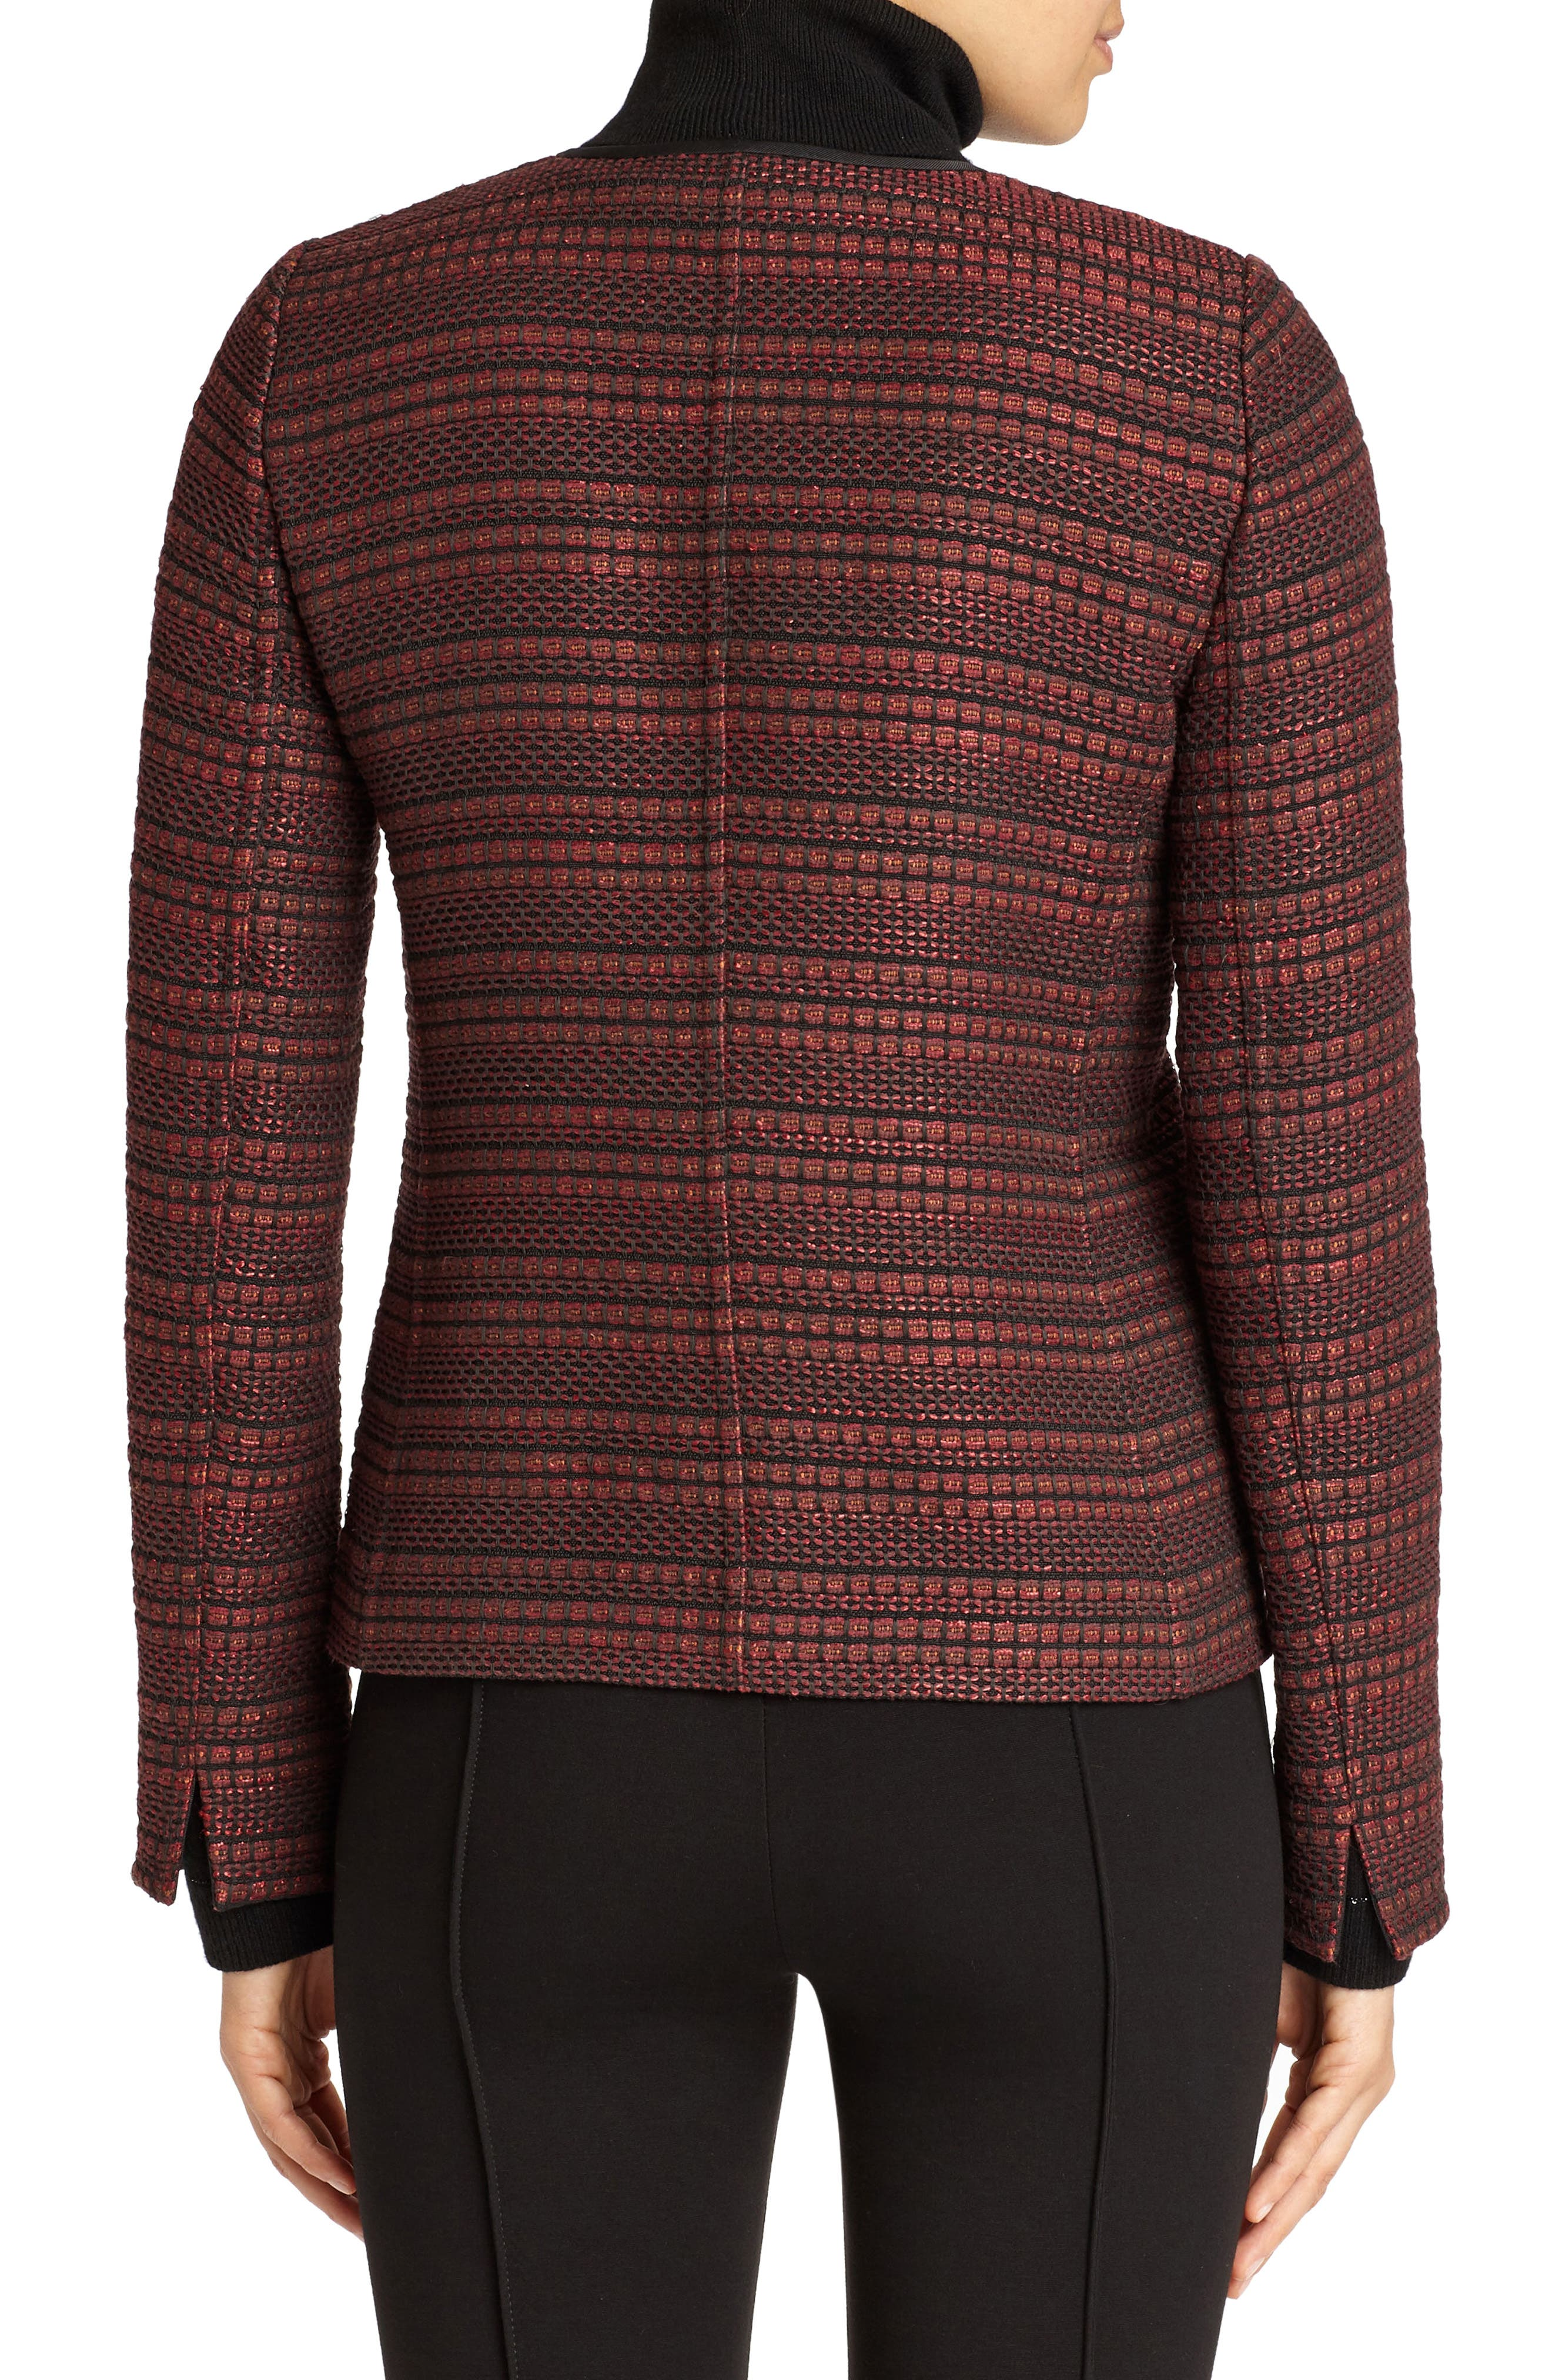 Laurence Venetian Tweed Jacket,                             Alternate thumbnail 2, color,                             Shiraz Multi